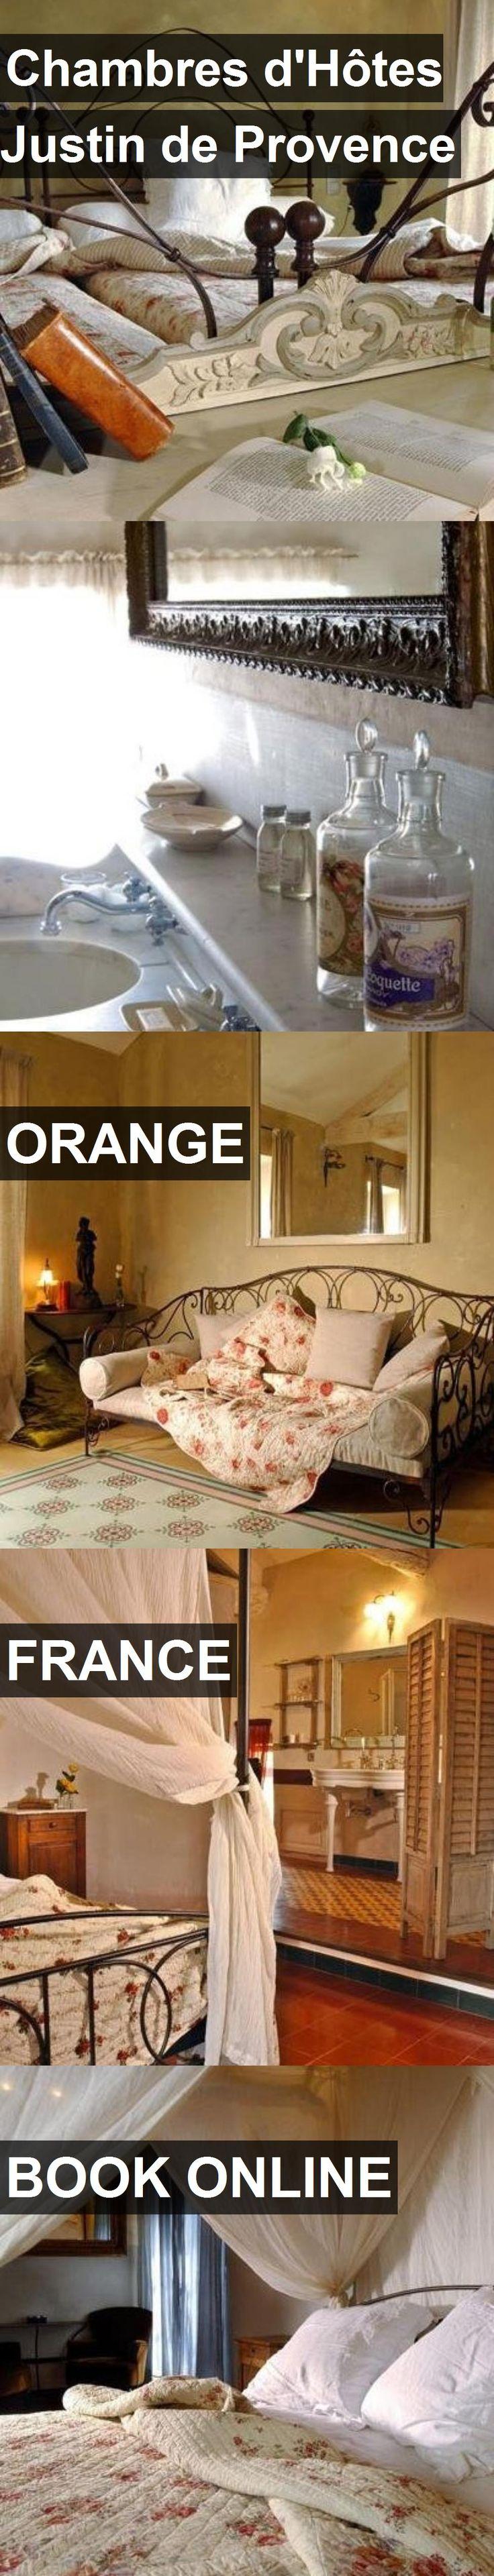 Best 25+ Orange france ideas on Pinterest | France colors, France ...